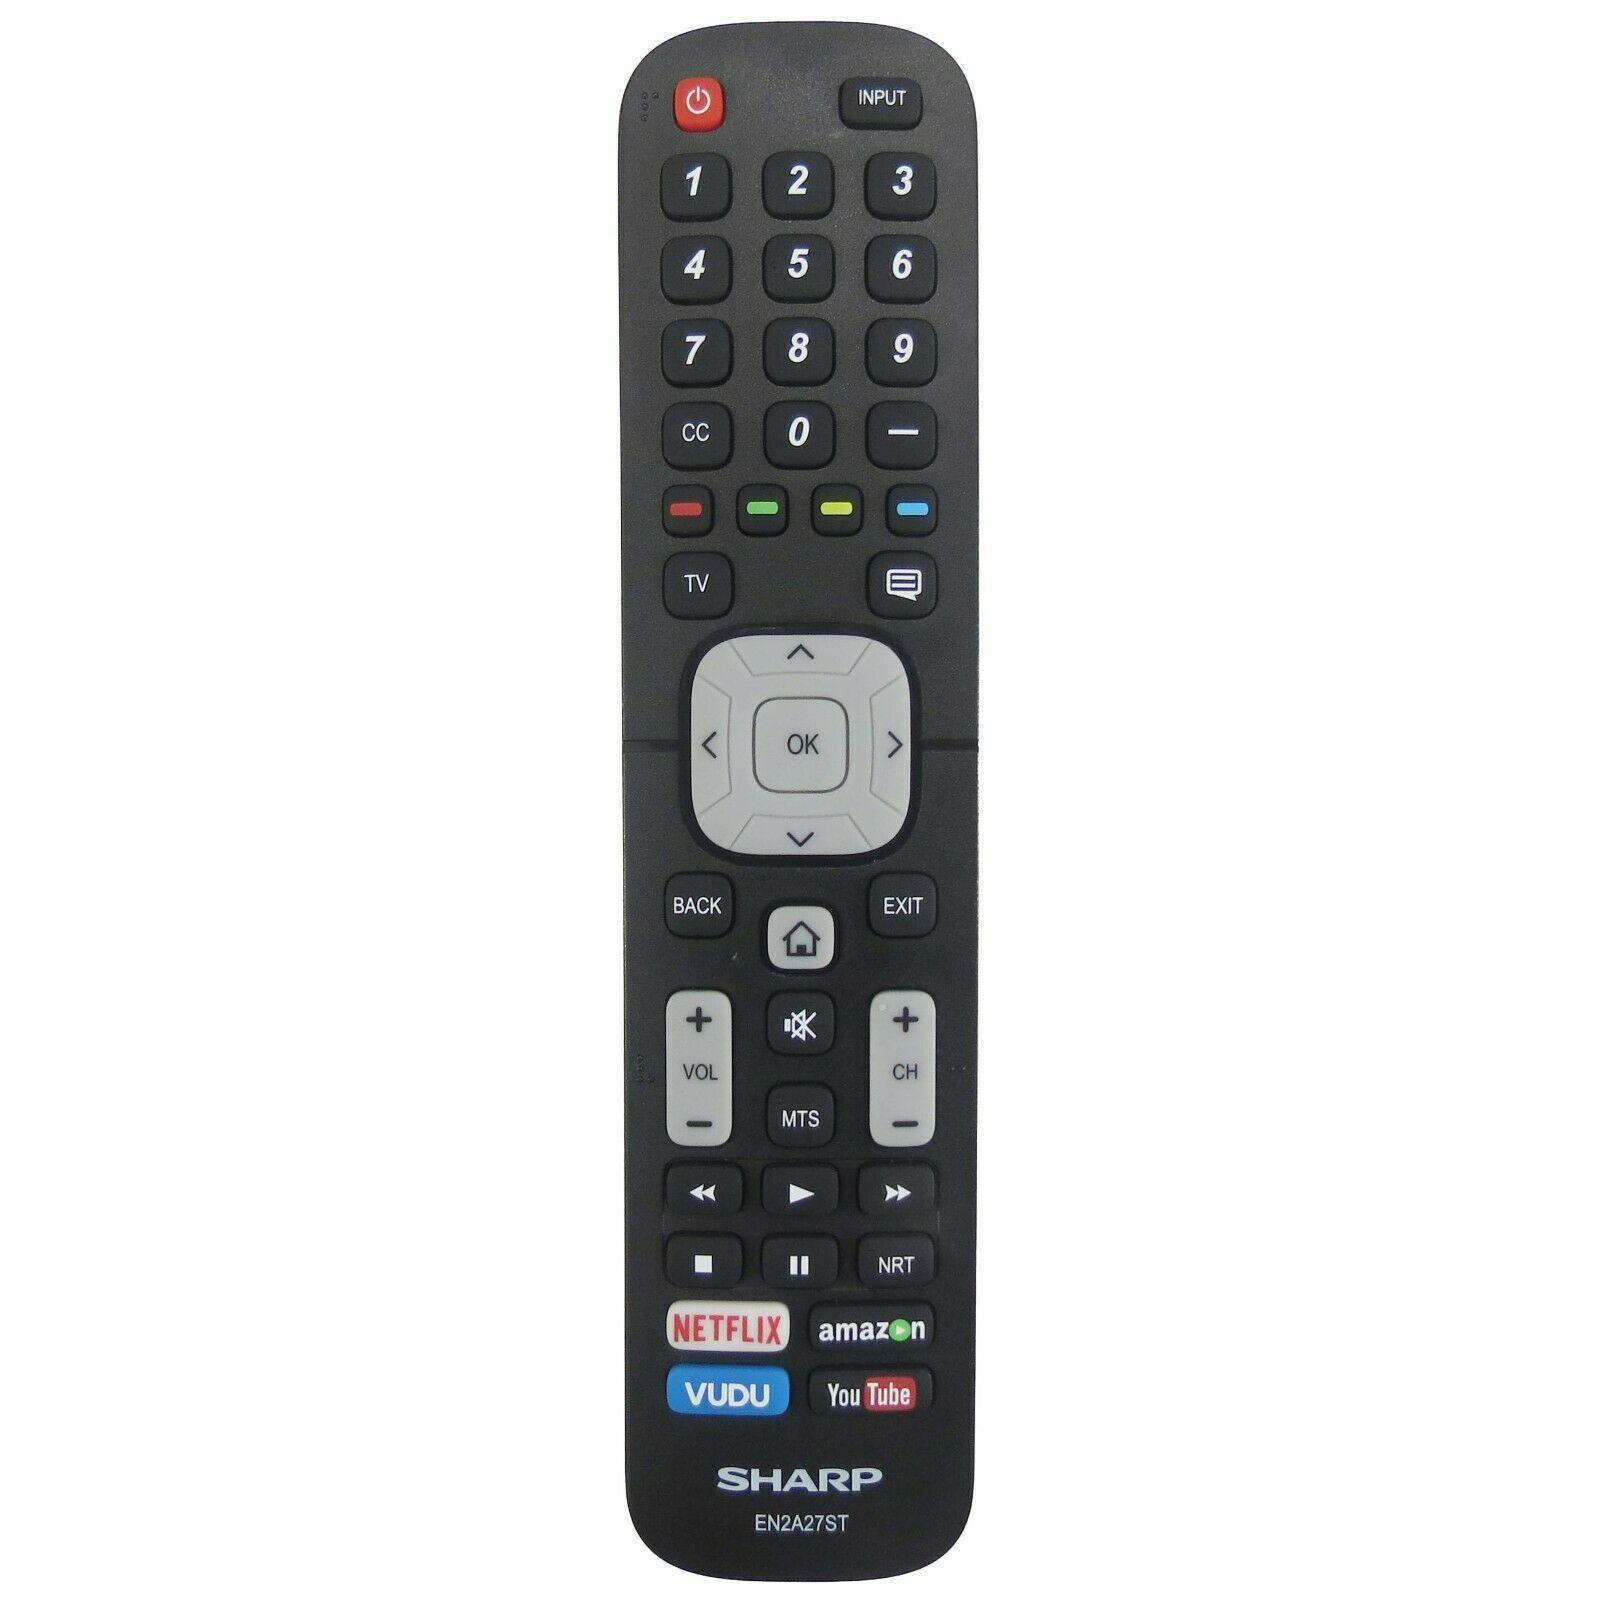 Sharp EN2A27ST *MISSING BATTERY COVER* Factory Original TV Remote LC-32Q5230U - $9.58